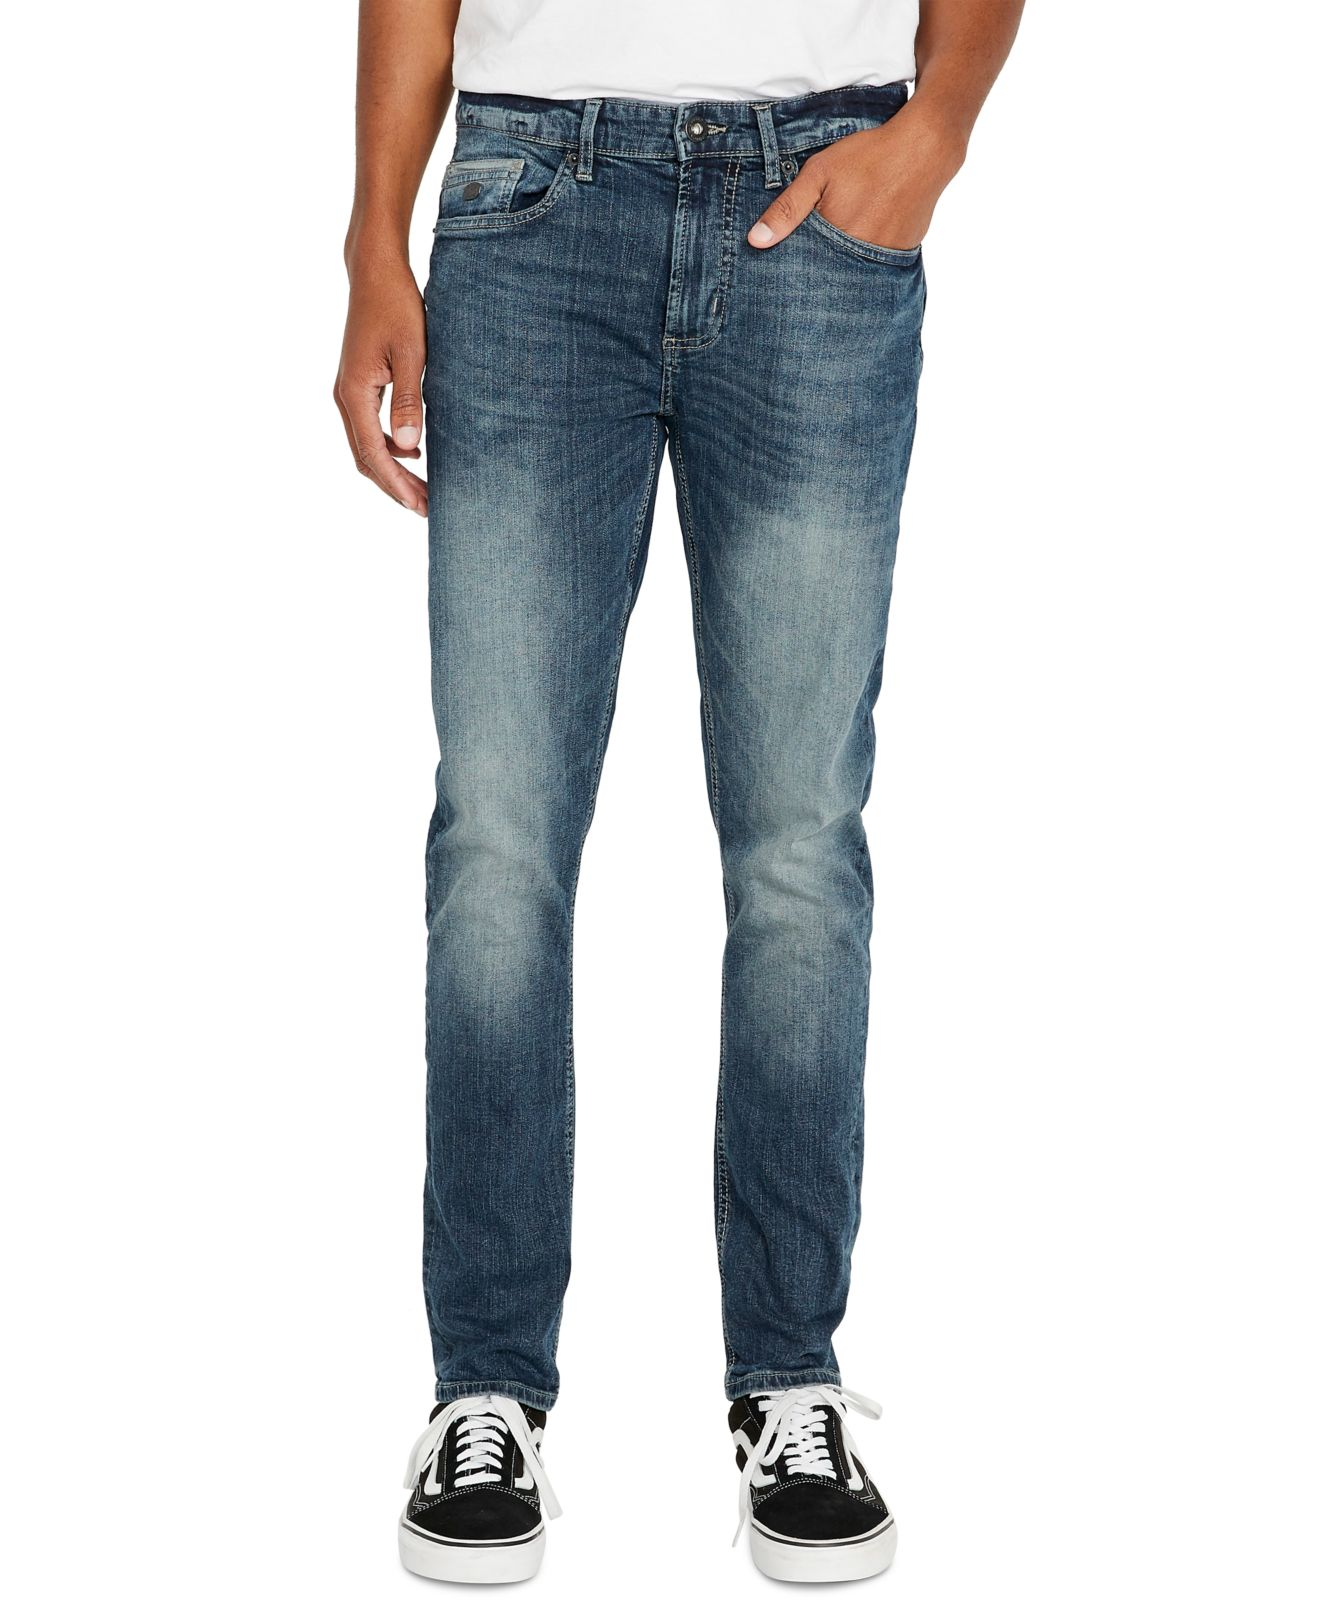 Buffalo Jean Mens Jeans Blue Size 32X32 Max-X Skinny Washed Stretch